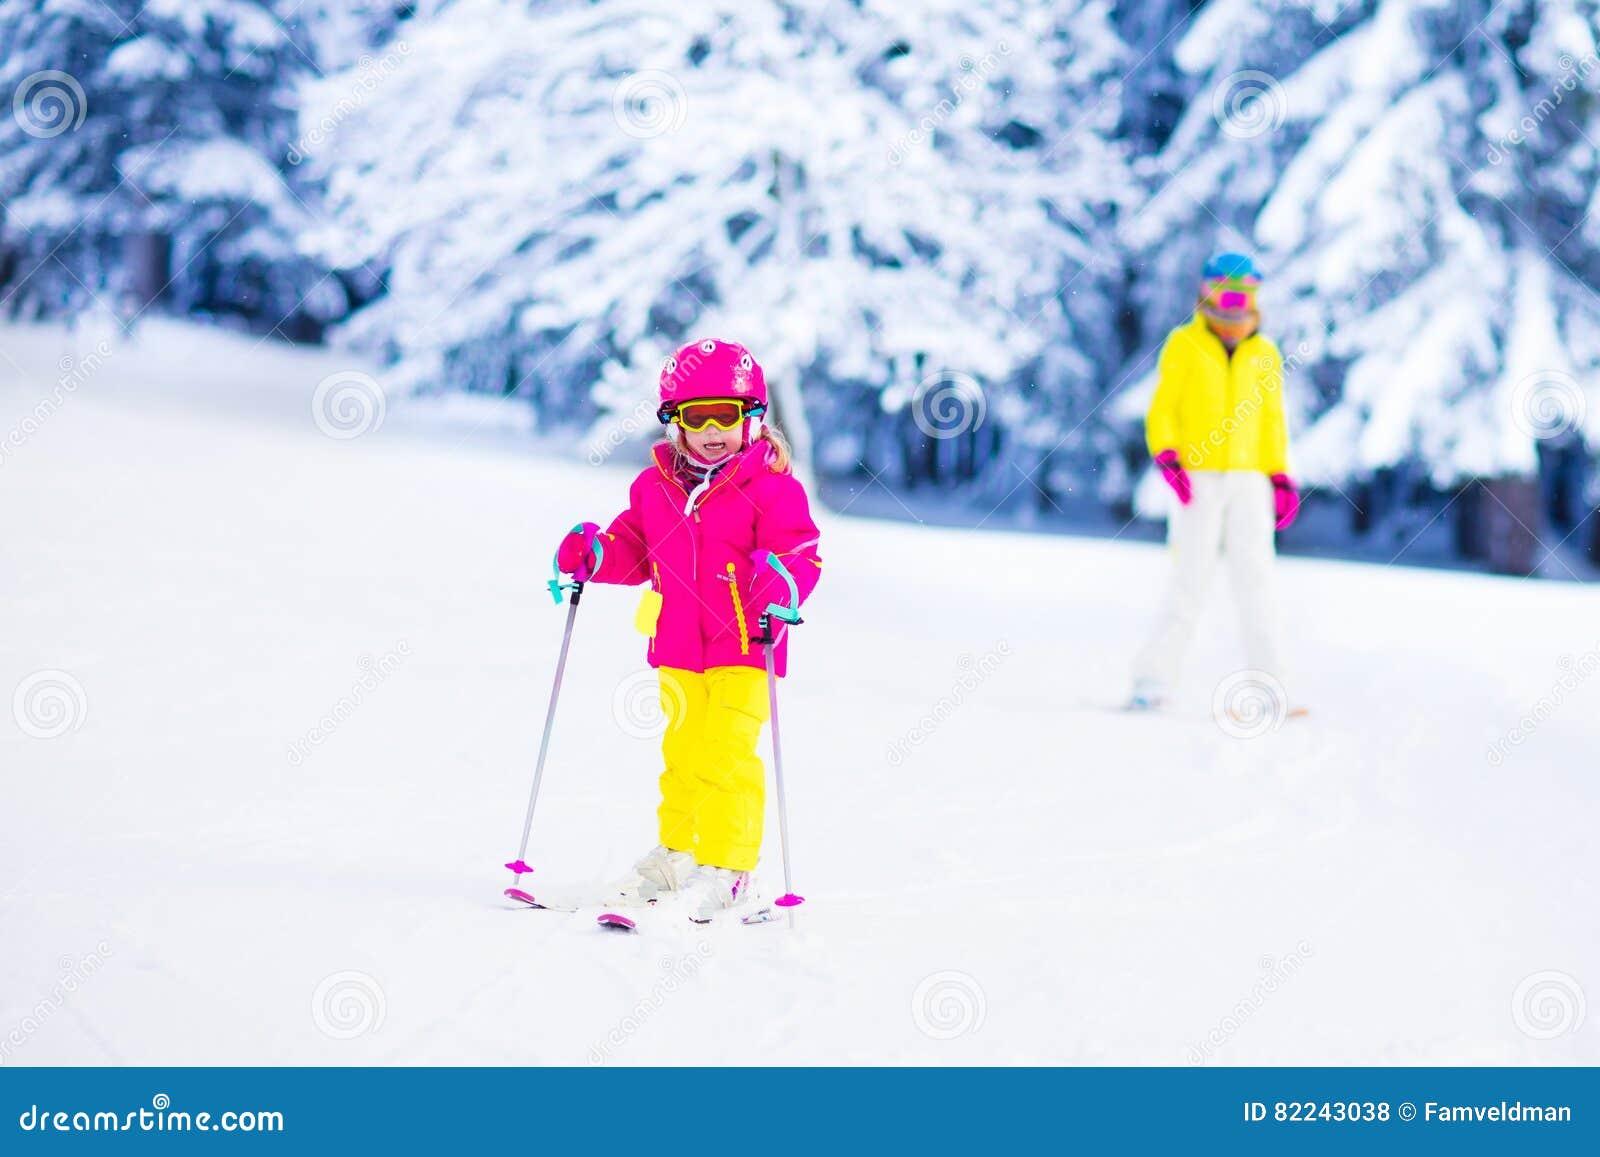 43da58699ba9 Family Ski And Snow Fun In Winter Mountains Stock Photo - Image of ...